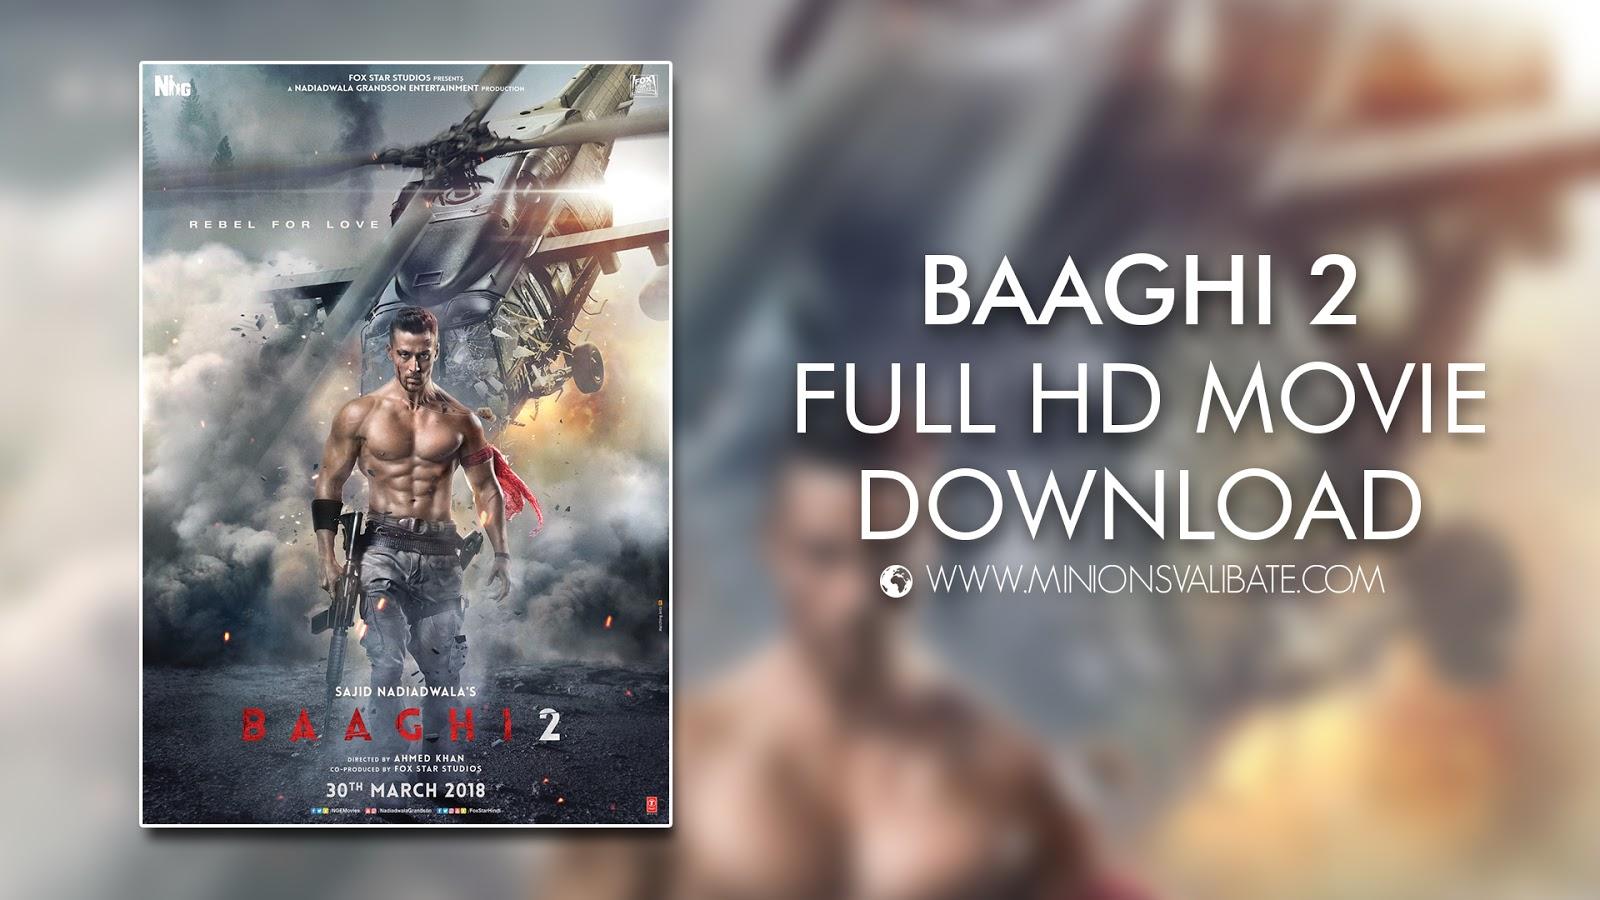 BAAGHI 2 FULL HD MOVIE DOWANLOAD